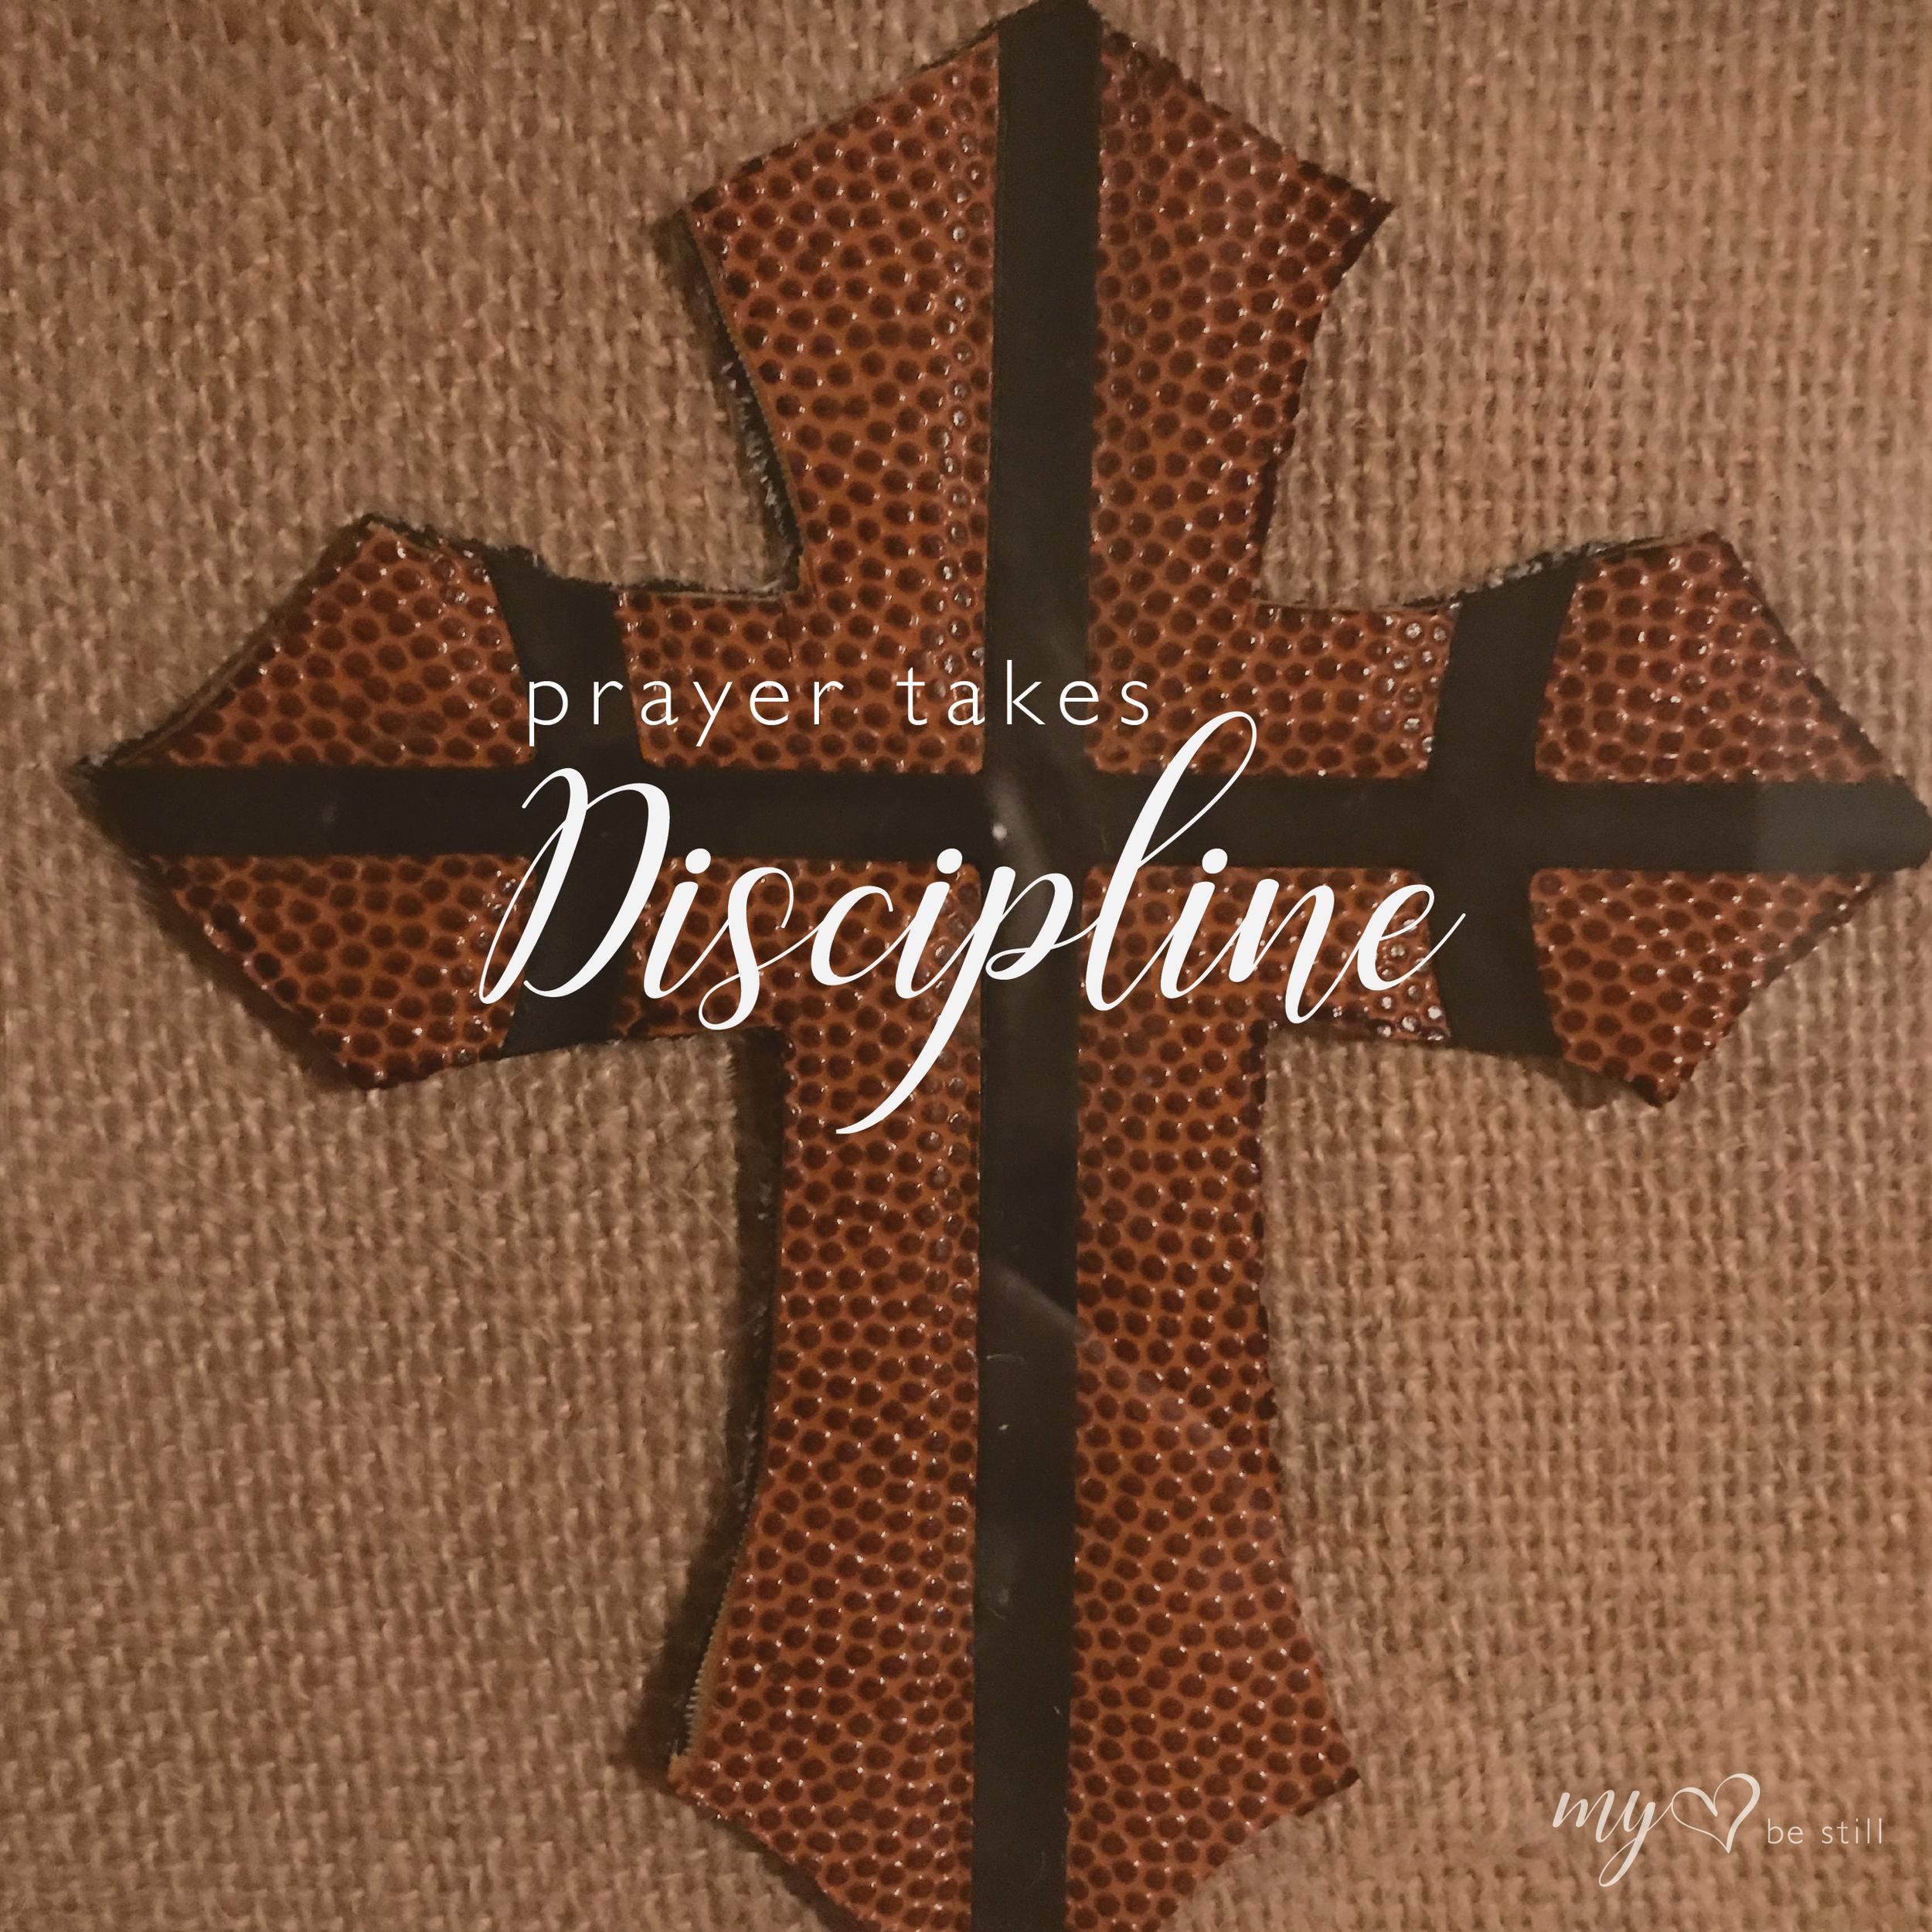 discipline-02.png